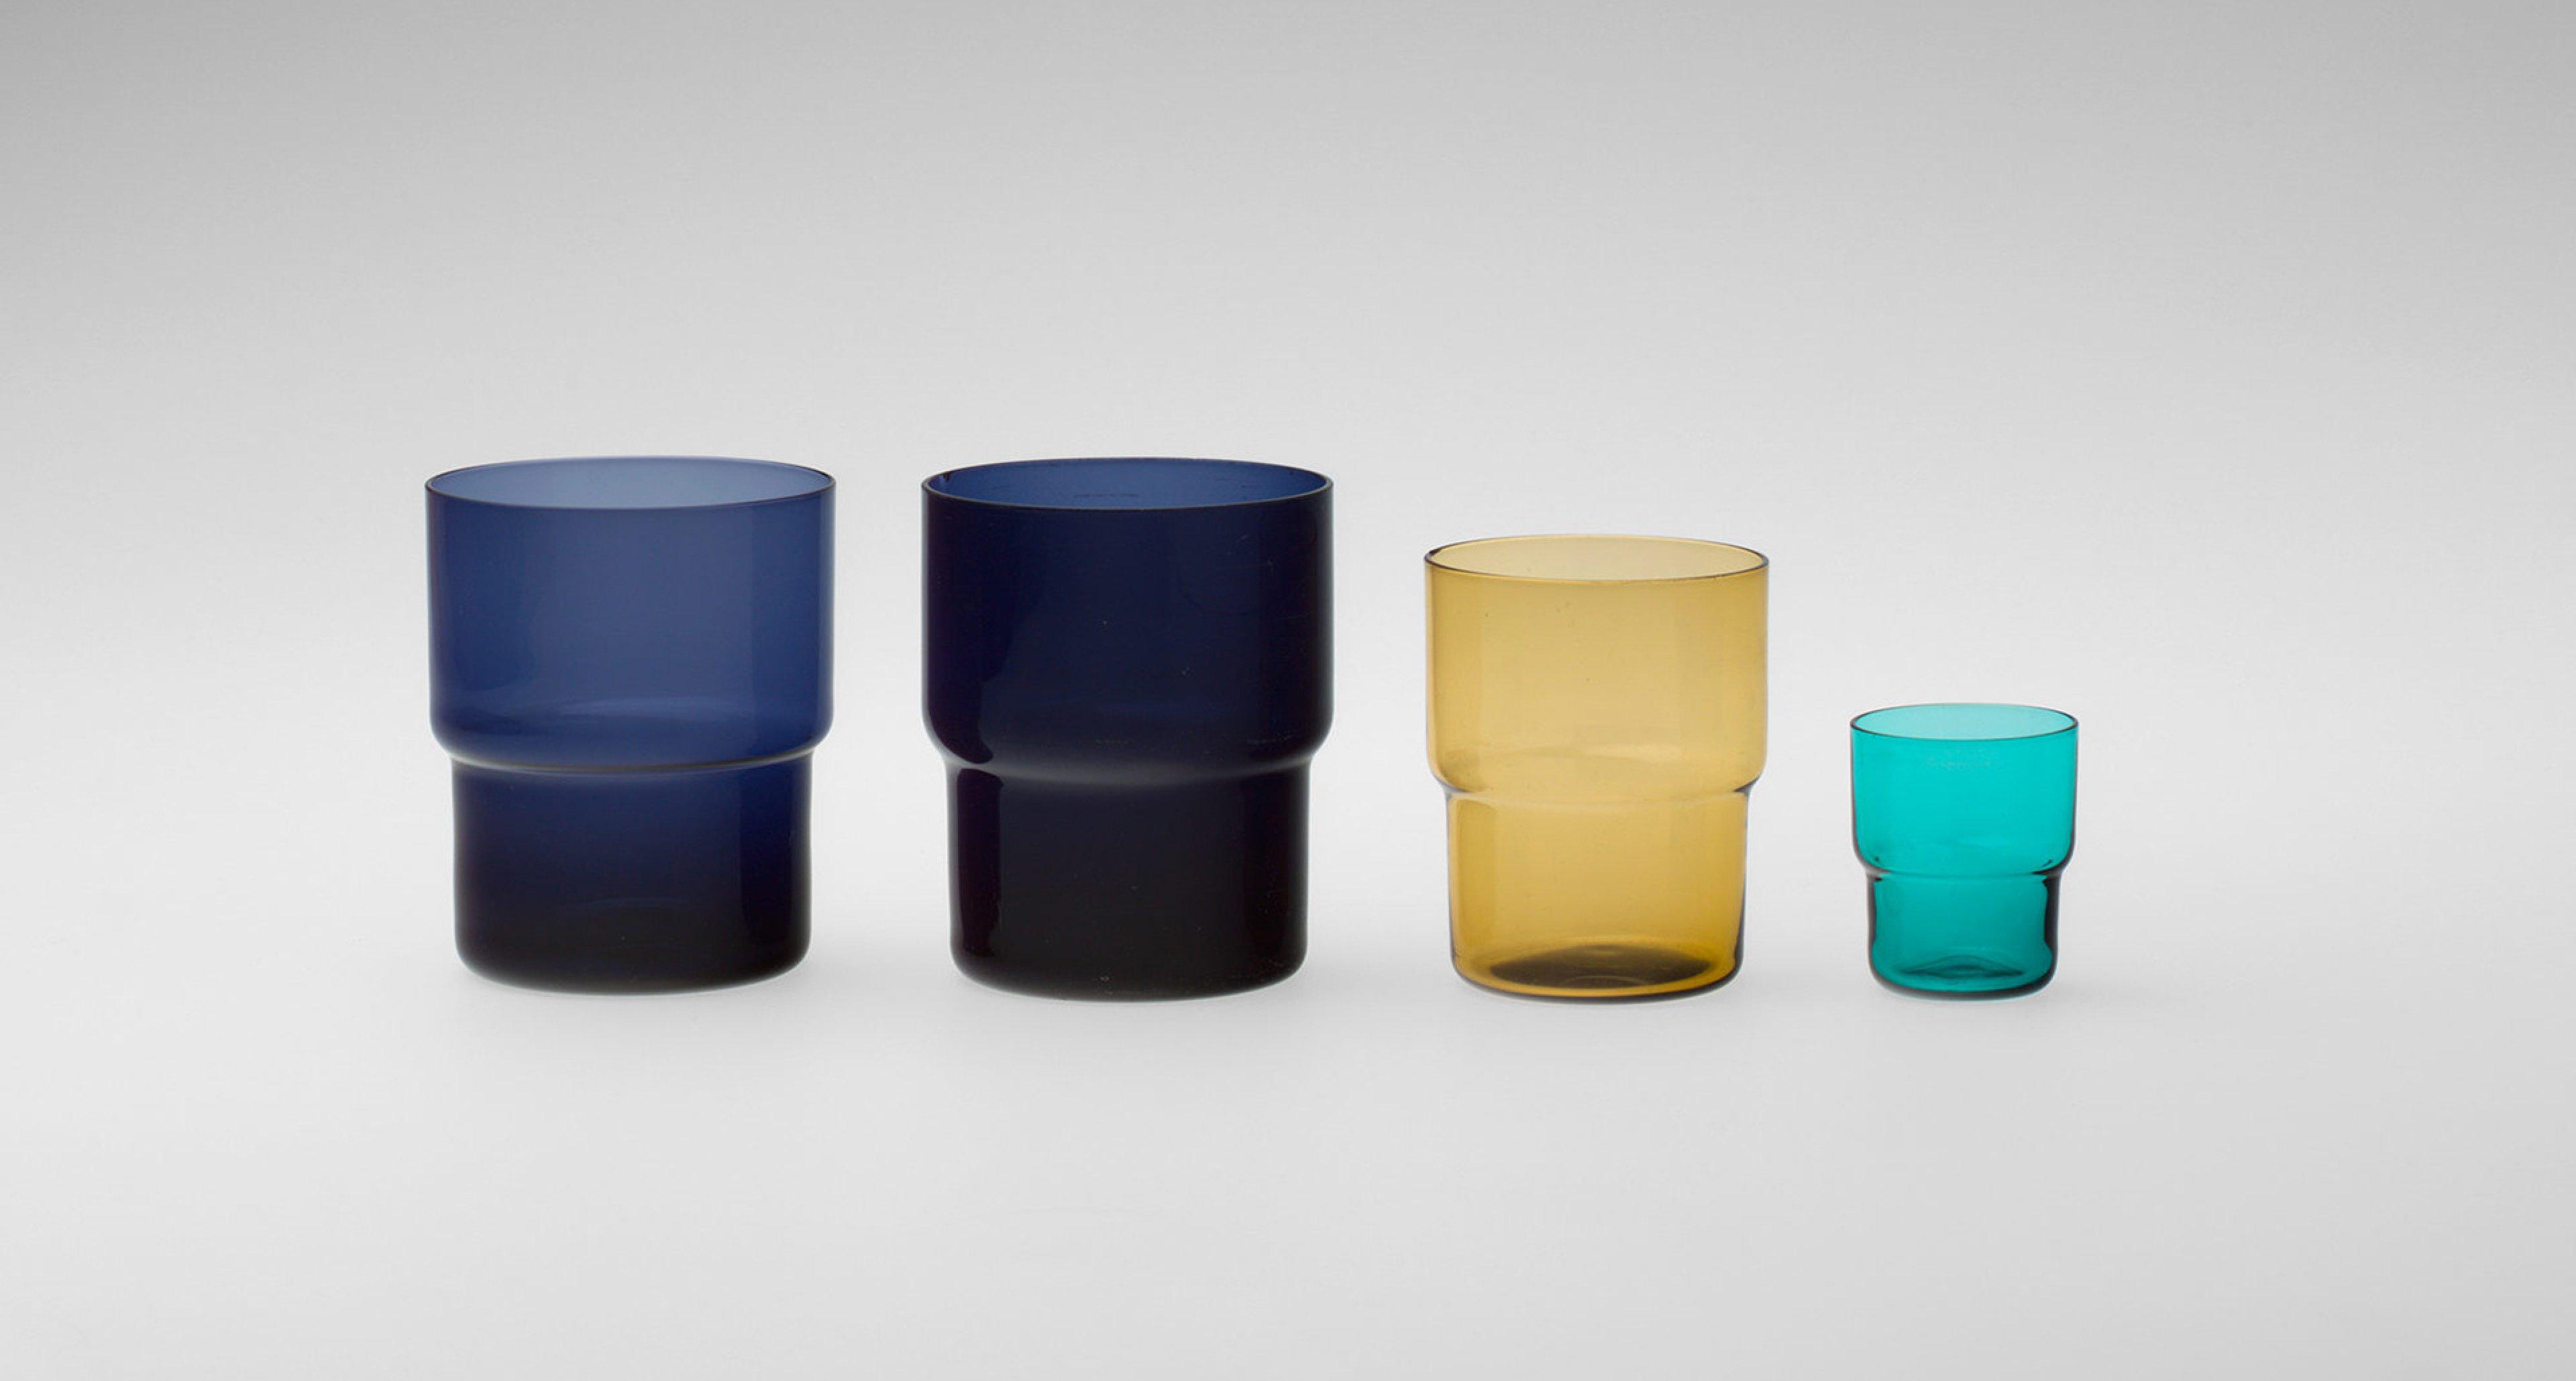 Saara Hopea (Finnish, 1925–1984). Stacking Glasses. 1951. Blown glass, .1‑.2 (blue): 3 3/8 × 2 7/8″ (8.6 × 7.3 cm); .3 (yellow): 2 15/16 x 2 3/8″ (7.5 x 6 cm); .4 (turquoise): 1 7/8 x 1 9/16″ (4.7 x 4 cm). Manufactured by Nuutajärvi Glass Works (Wärtsilä,